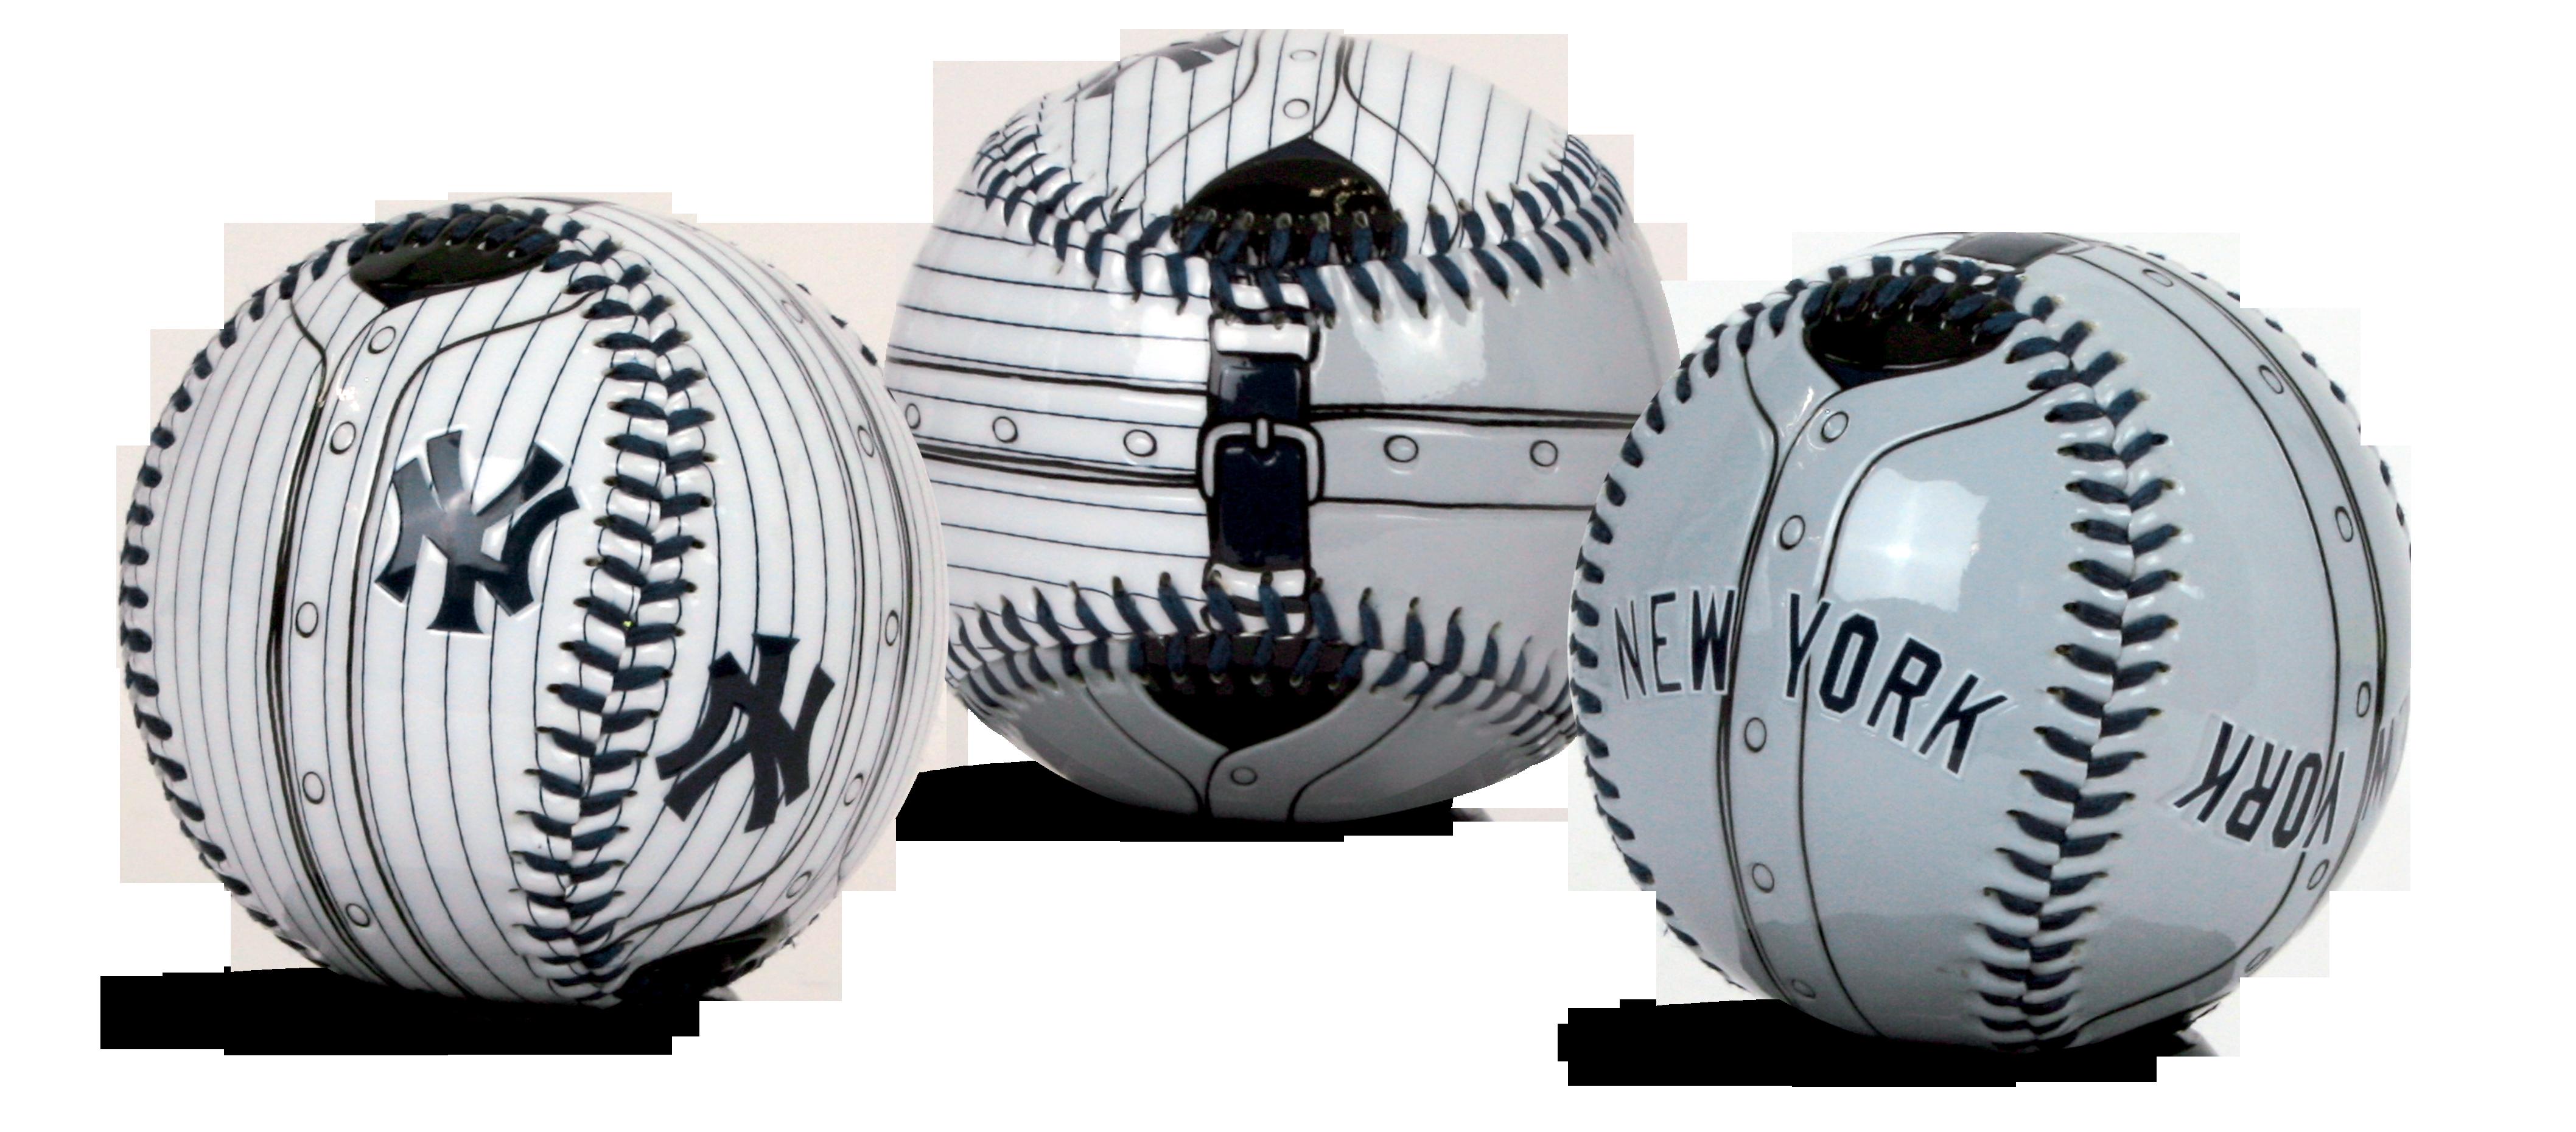 Rawlings Jersey Baseball Ball American Football Equipment Baseball